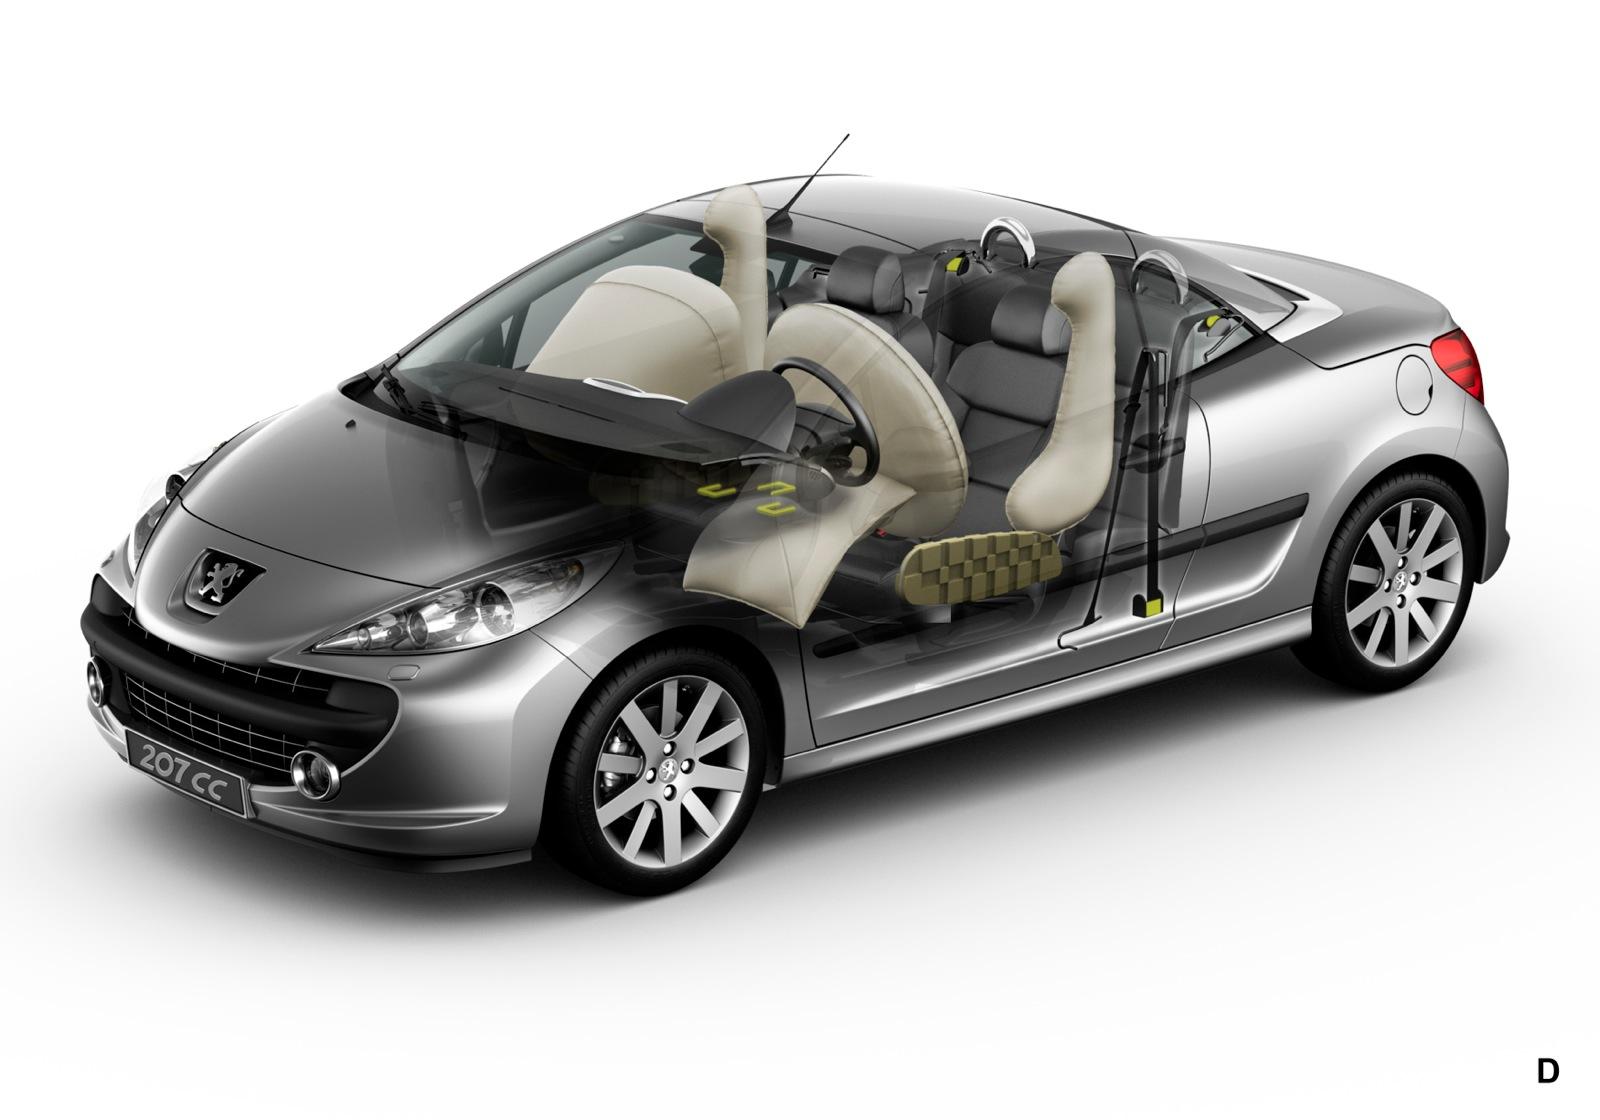 Peugeot 207 Cc Specs 2009 2010 2011 2012 2013 2014